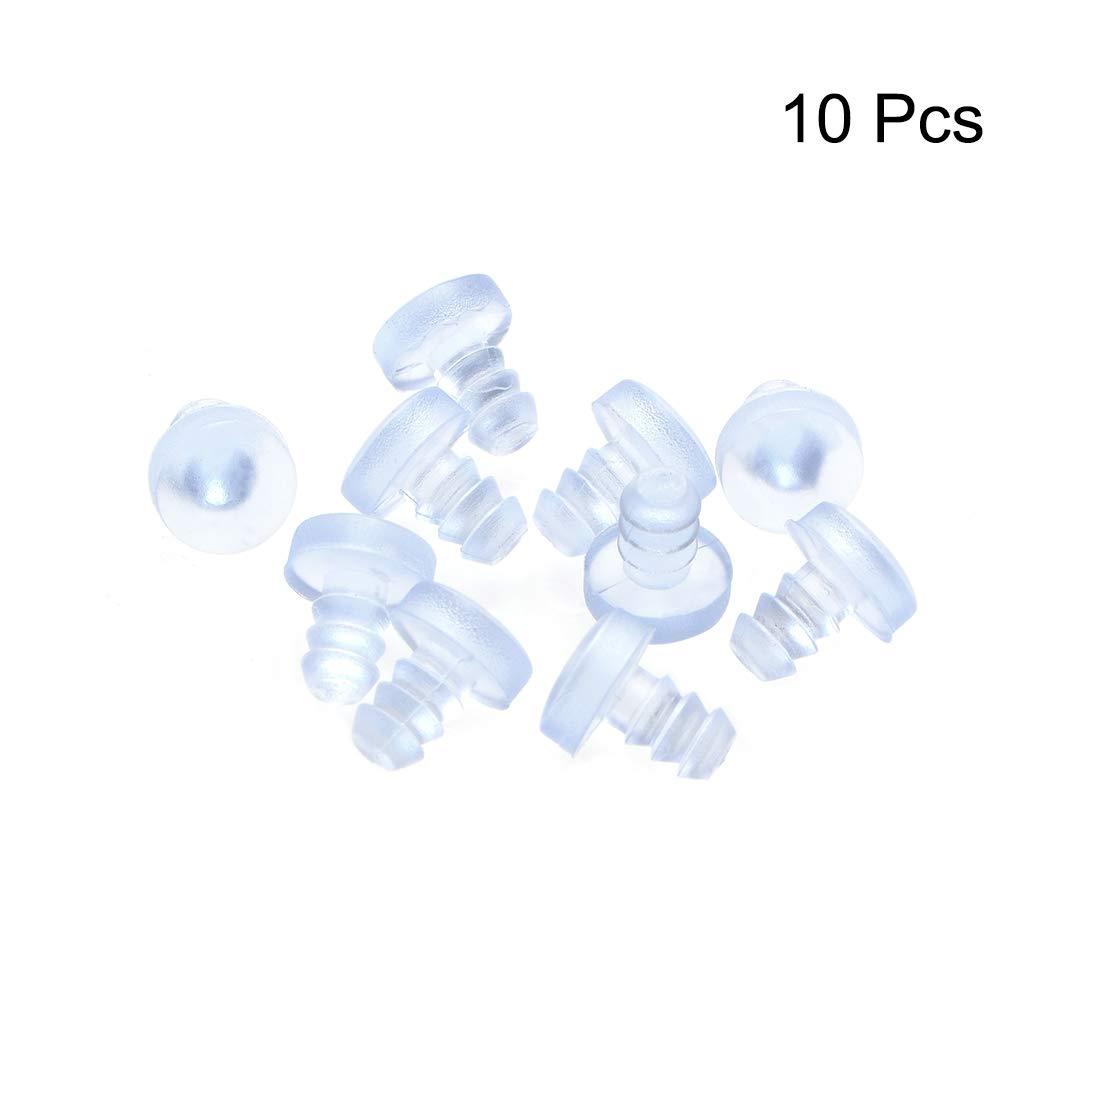 sourcing map Topes de silicona blandos de 5 mm de di/ámetro de rosca para Mueble de mesa de vidrio 10 piezas